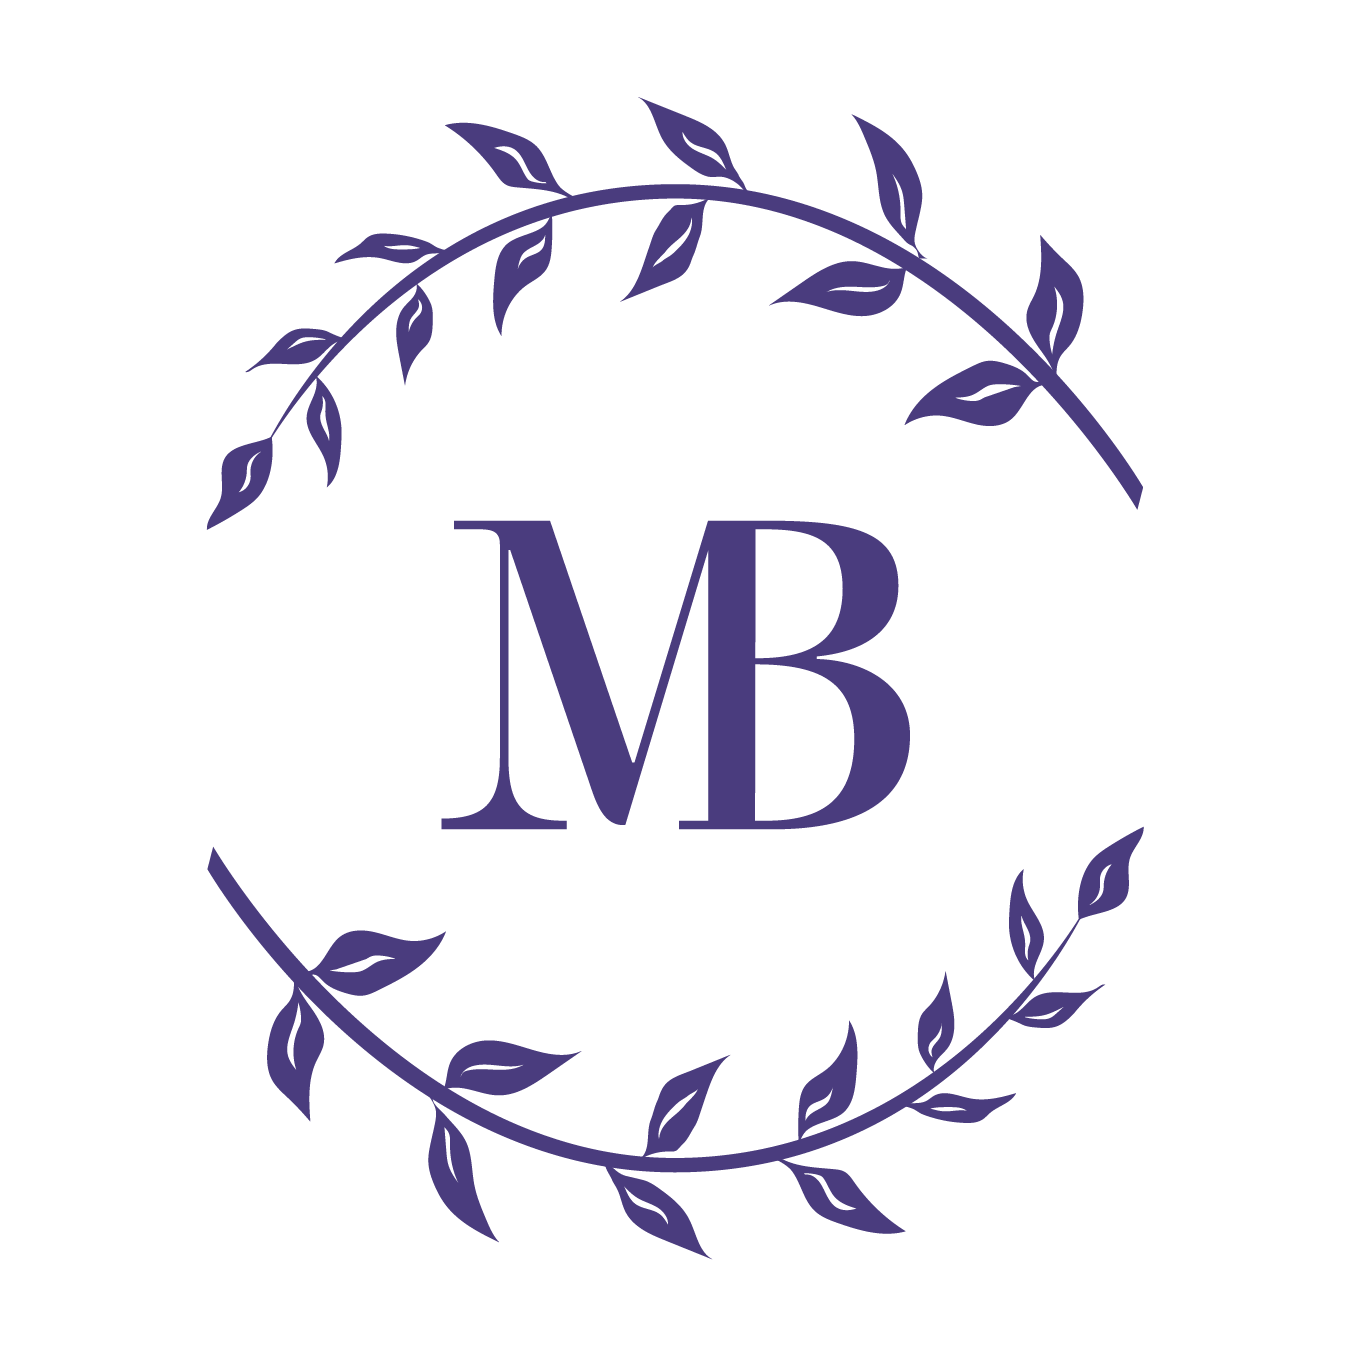 MB_wheatstock-logos-purple.png